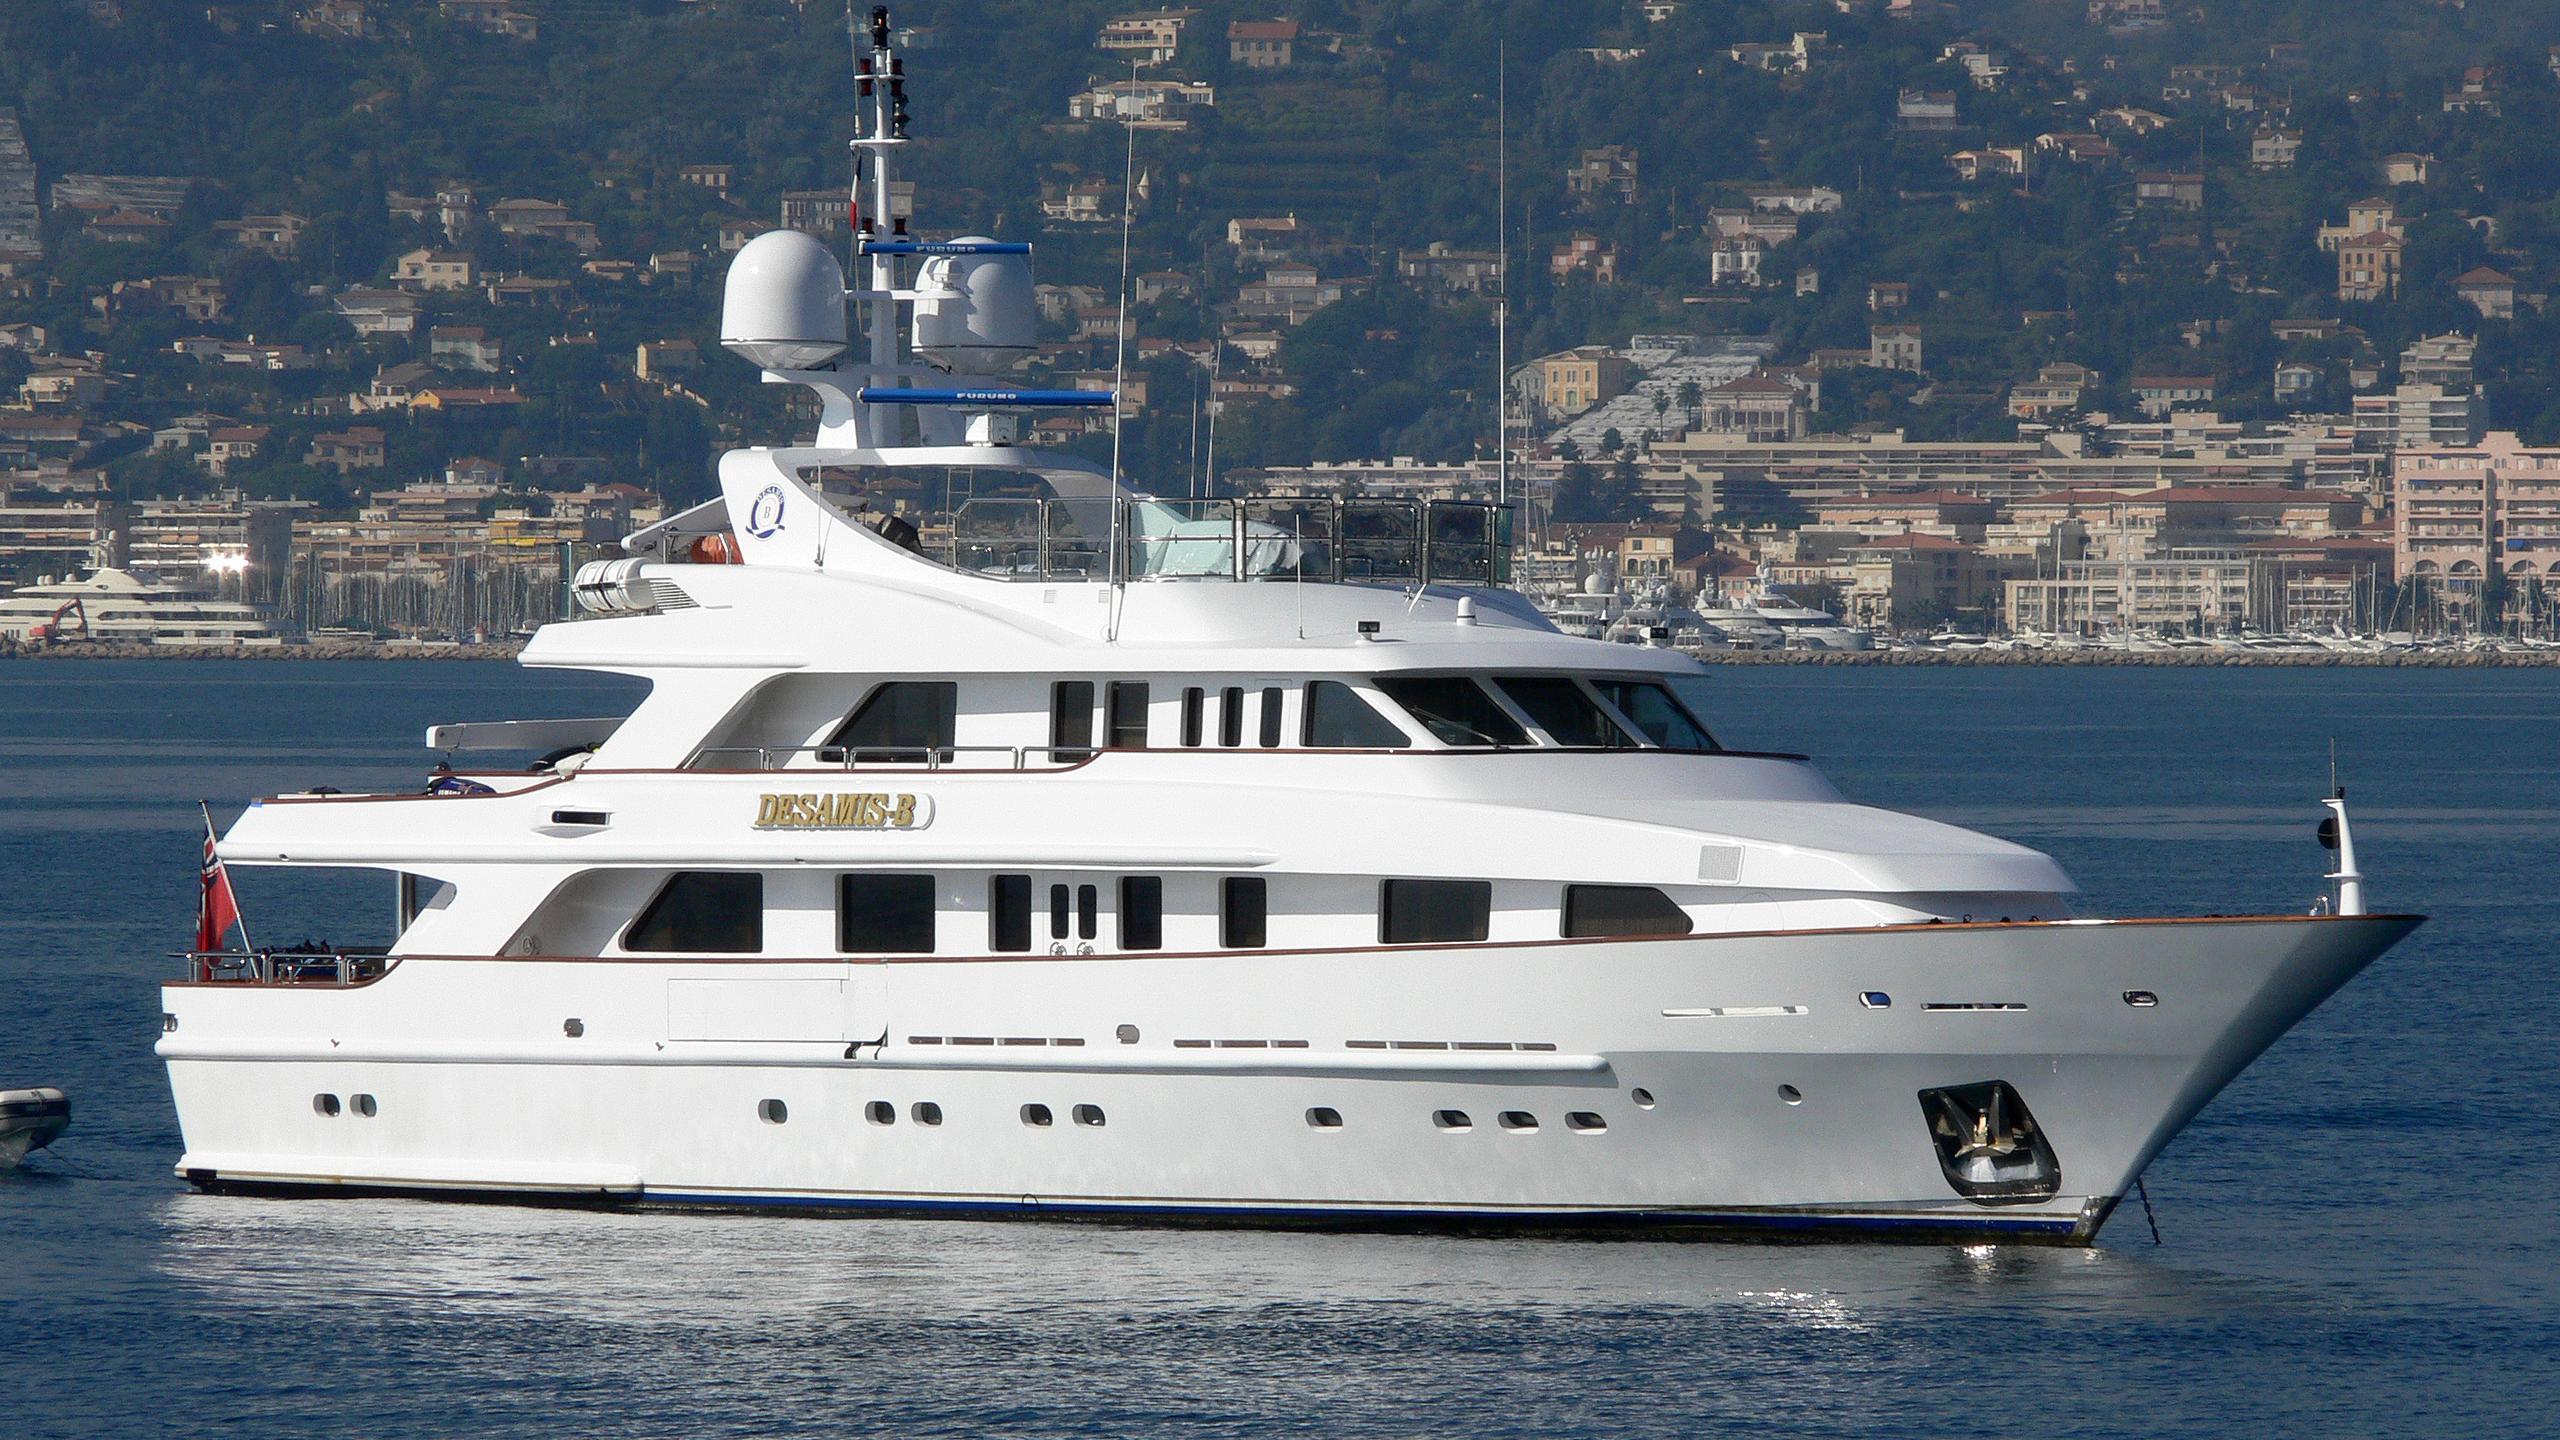 desamis-b-yacht-exterior